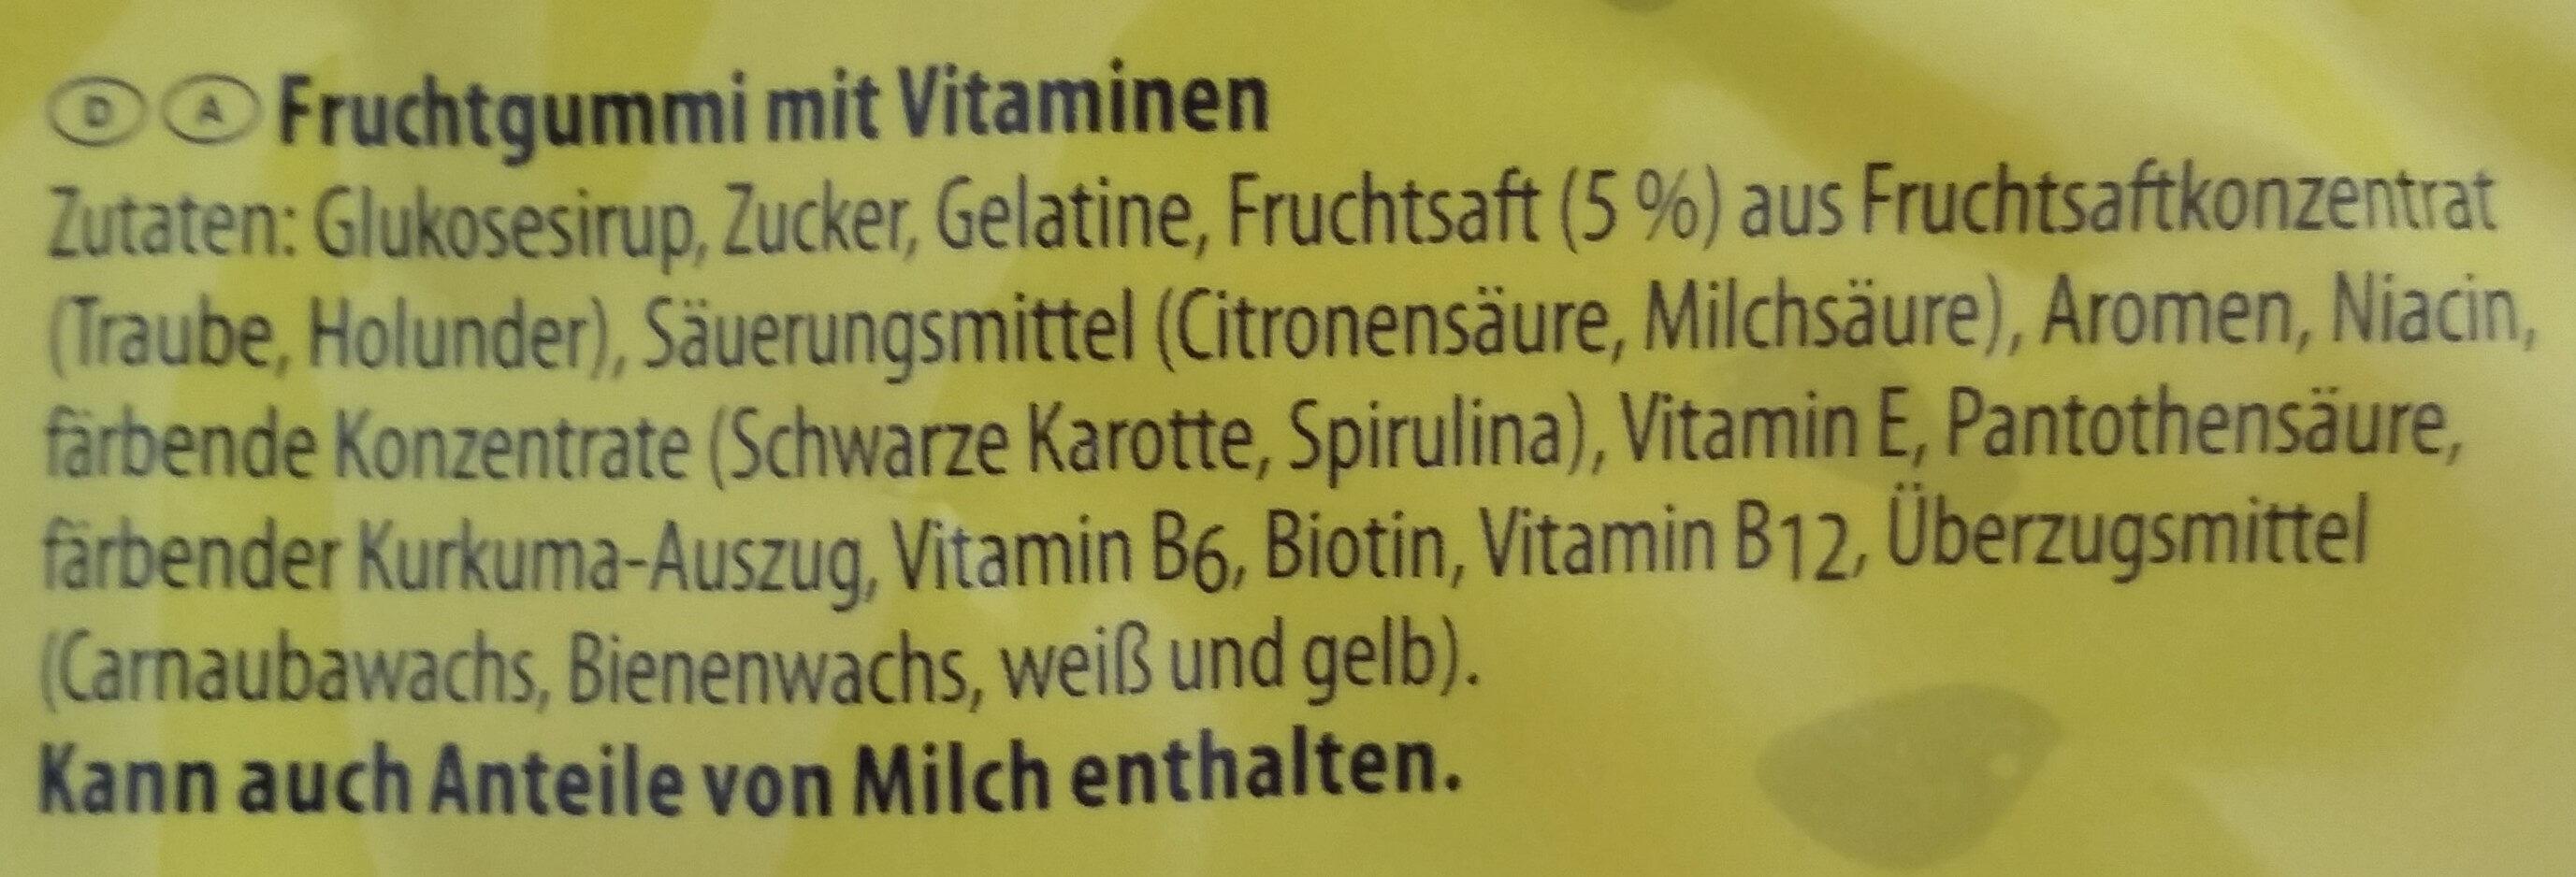 Nimm 2 Lachgummi - Ingredients